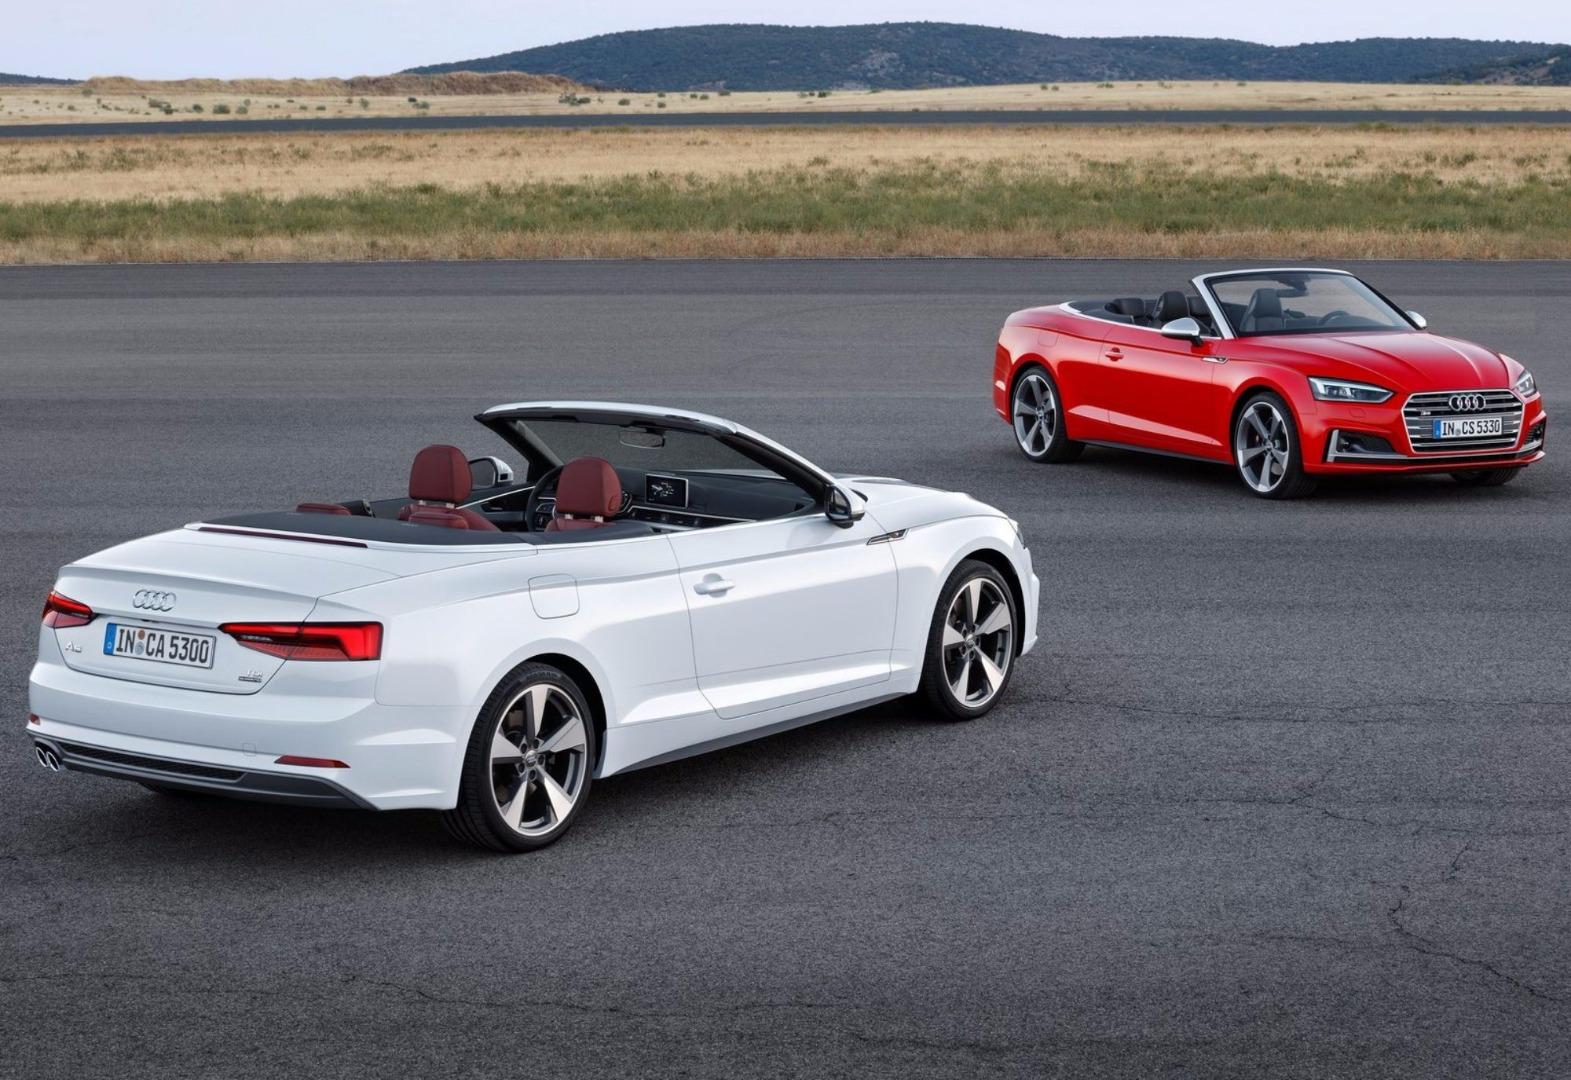 News Audi Previews All New A5 Cabriolet Ahead Of La Auto